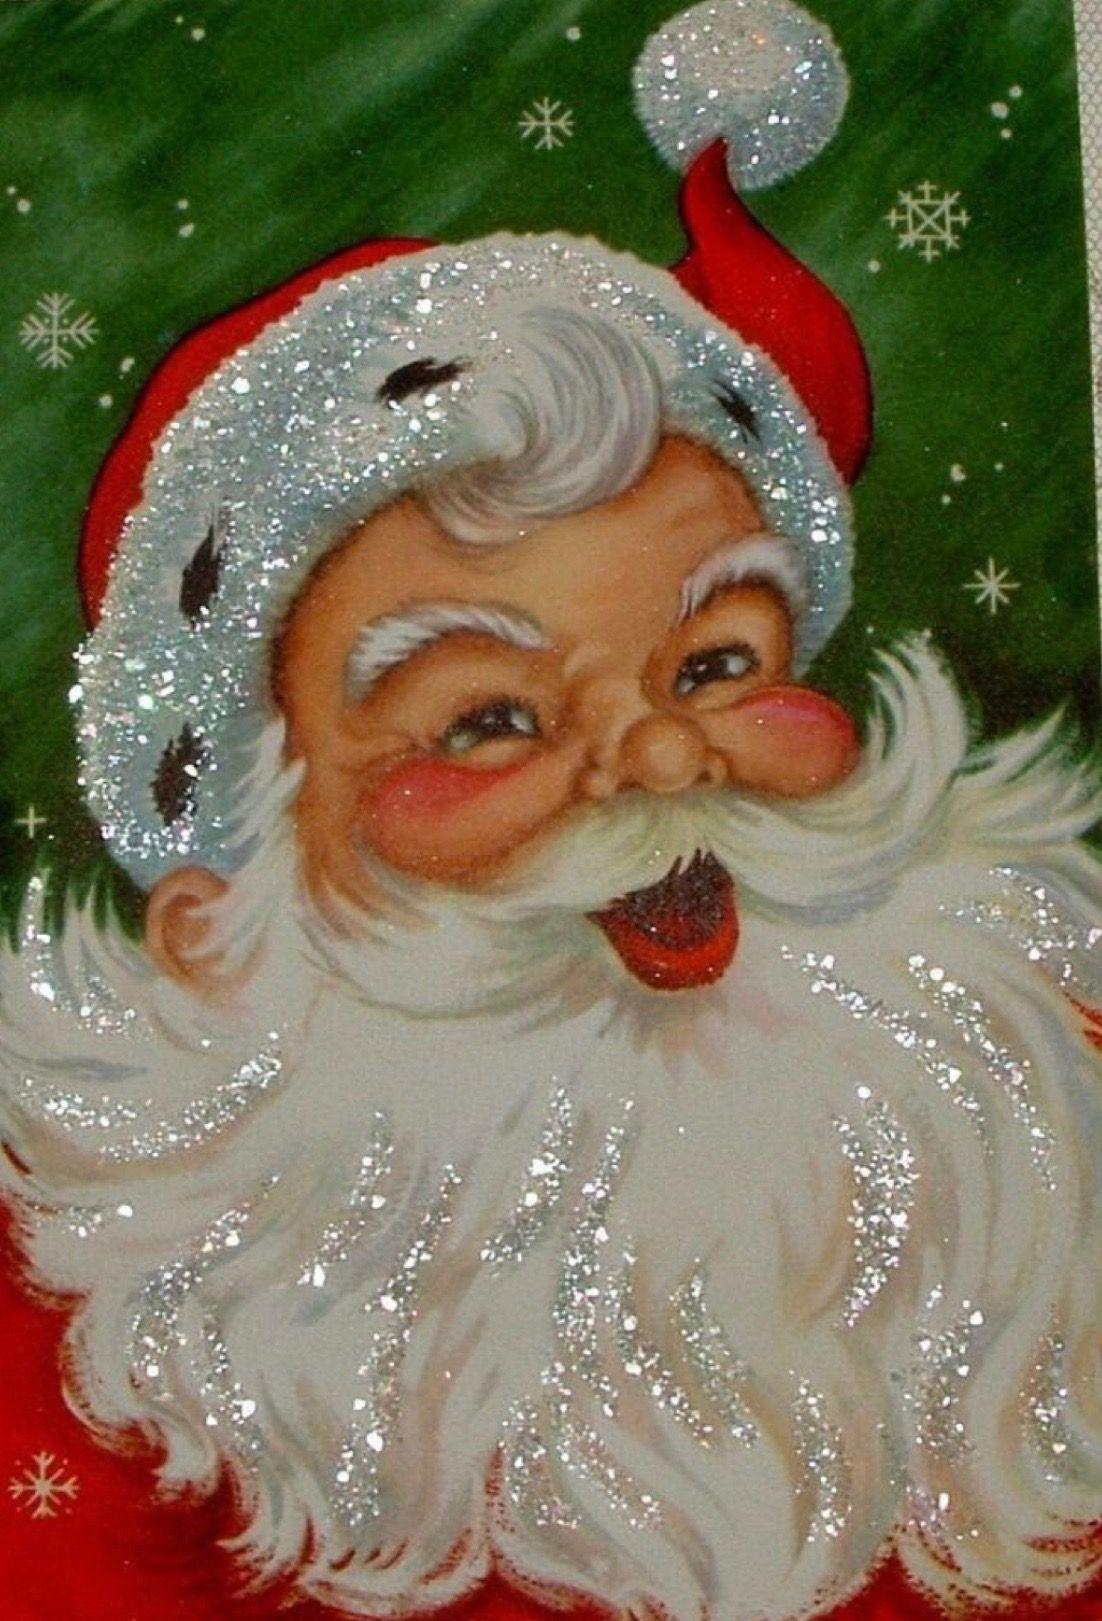 Pin By Penny Blair Leydic On Christmas Vintage Christmas Images Christmas Paintings Vintage Christmas